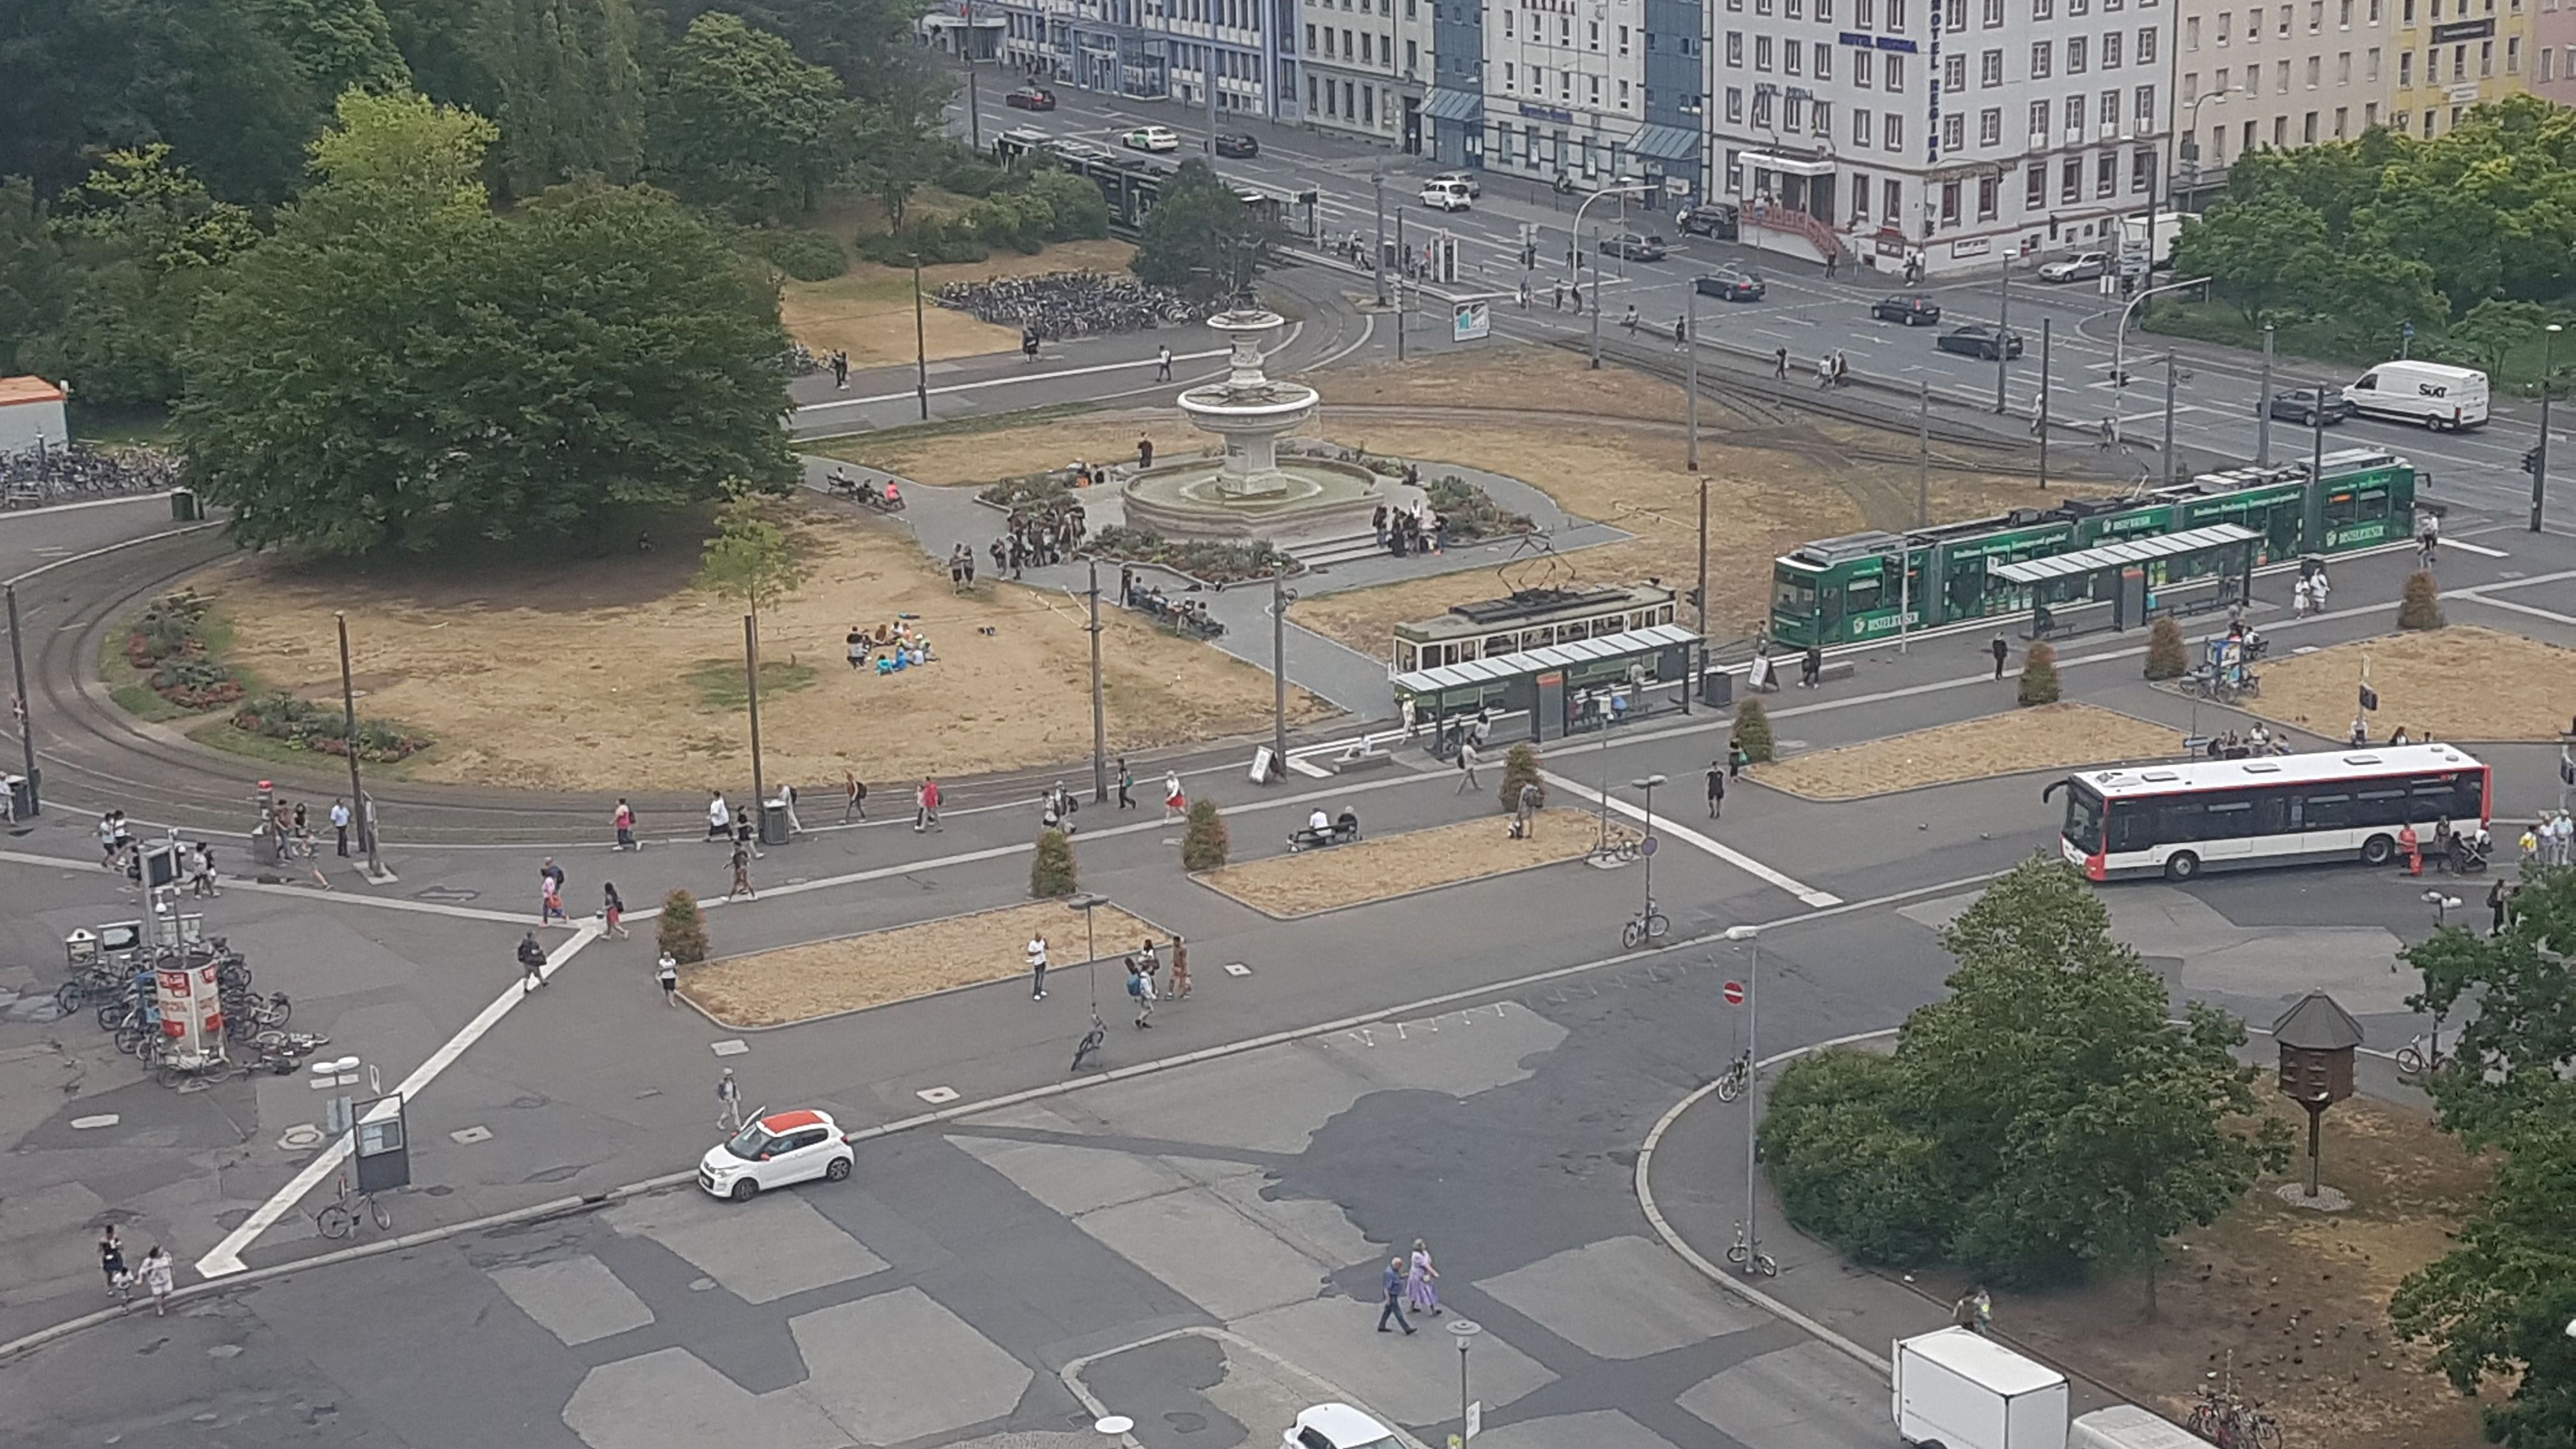 Kiliansbrunnen am Hauptbahnhof Würzburg